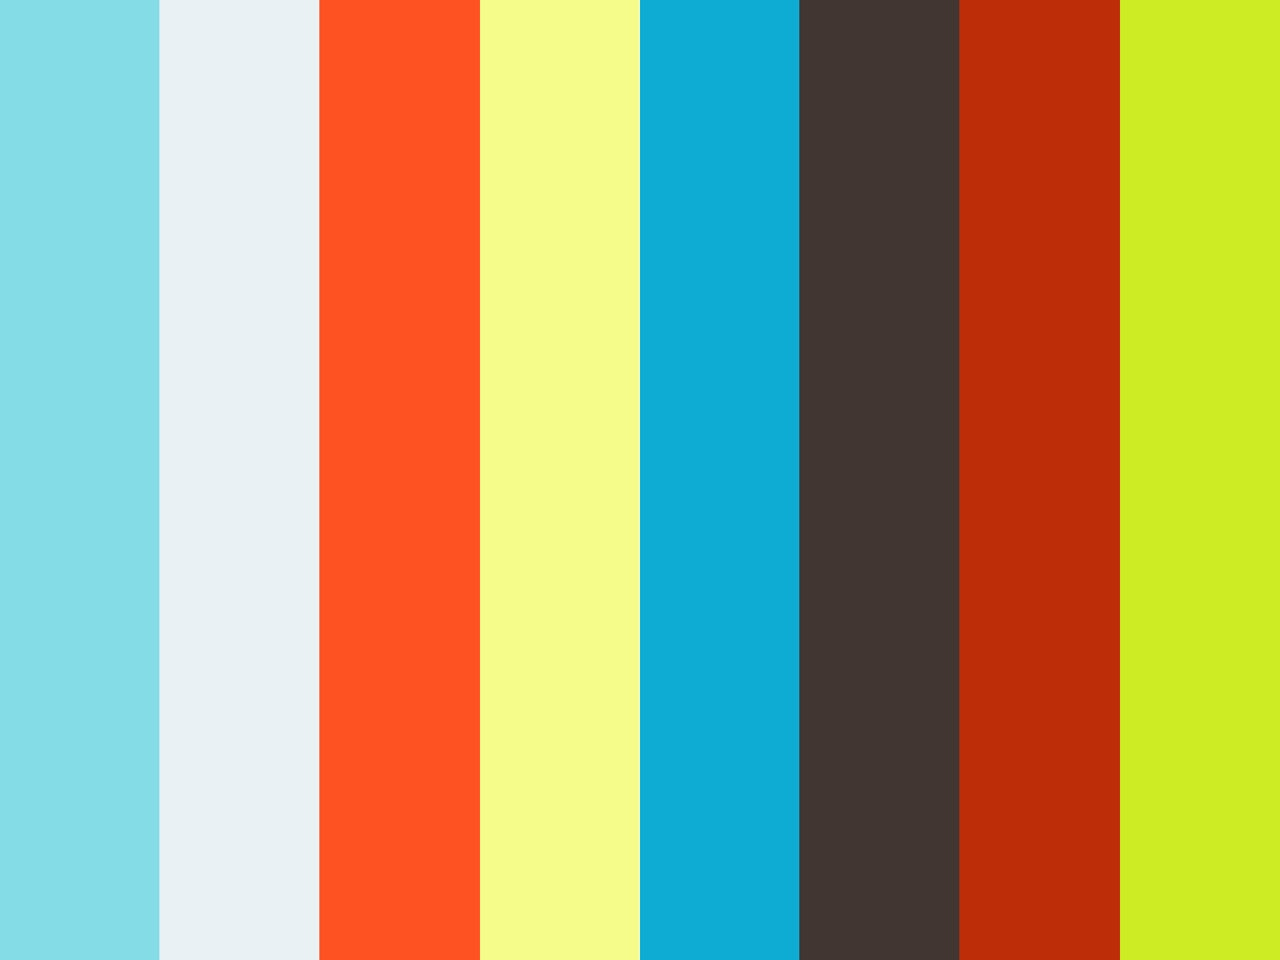 Fettkakao Stoff*Fabric ||FKKP4||